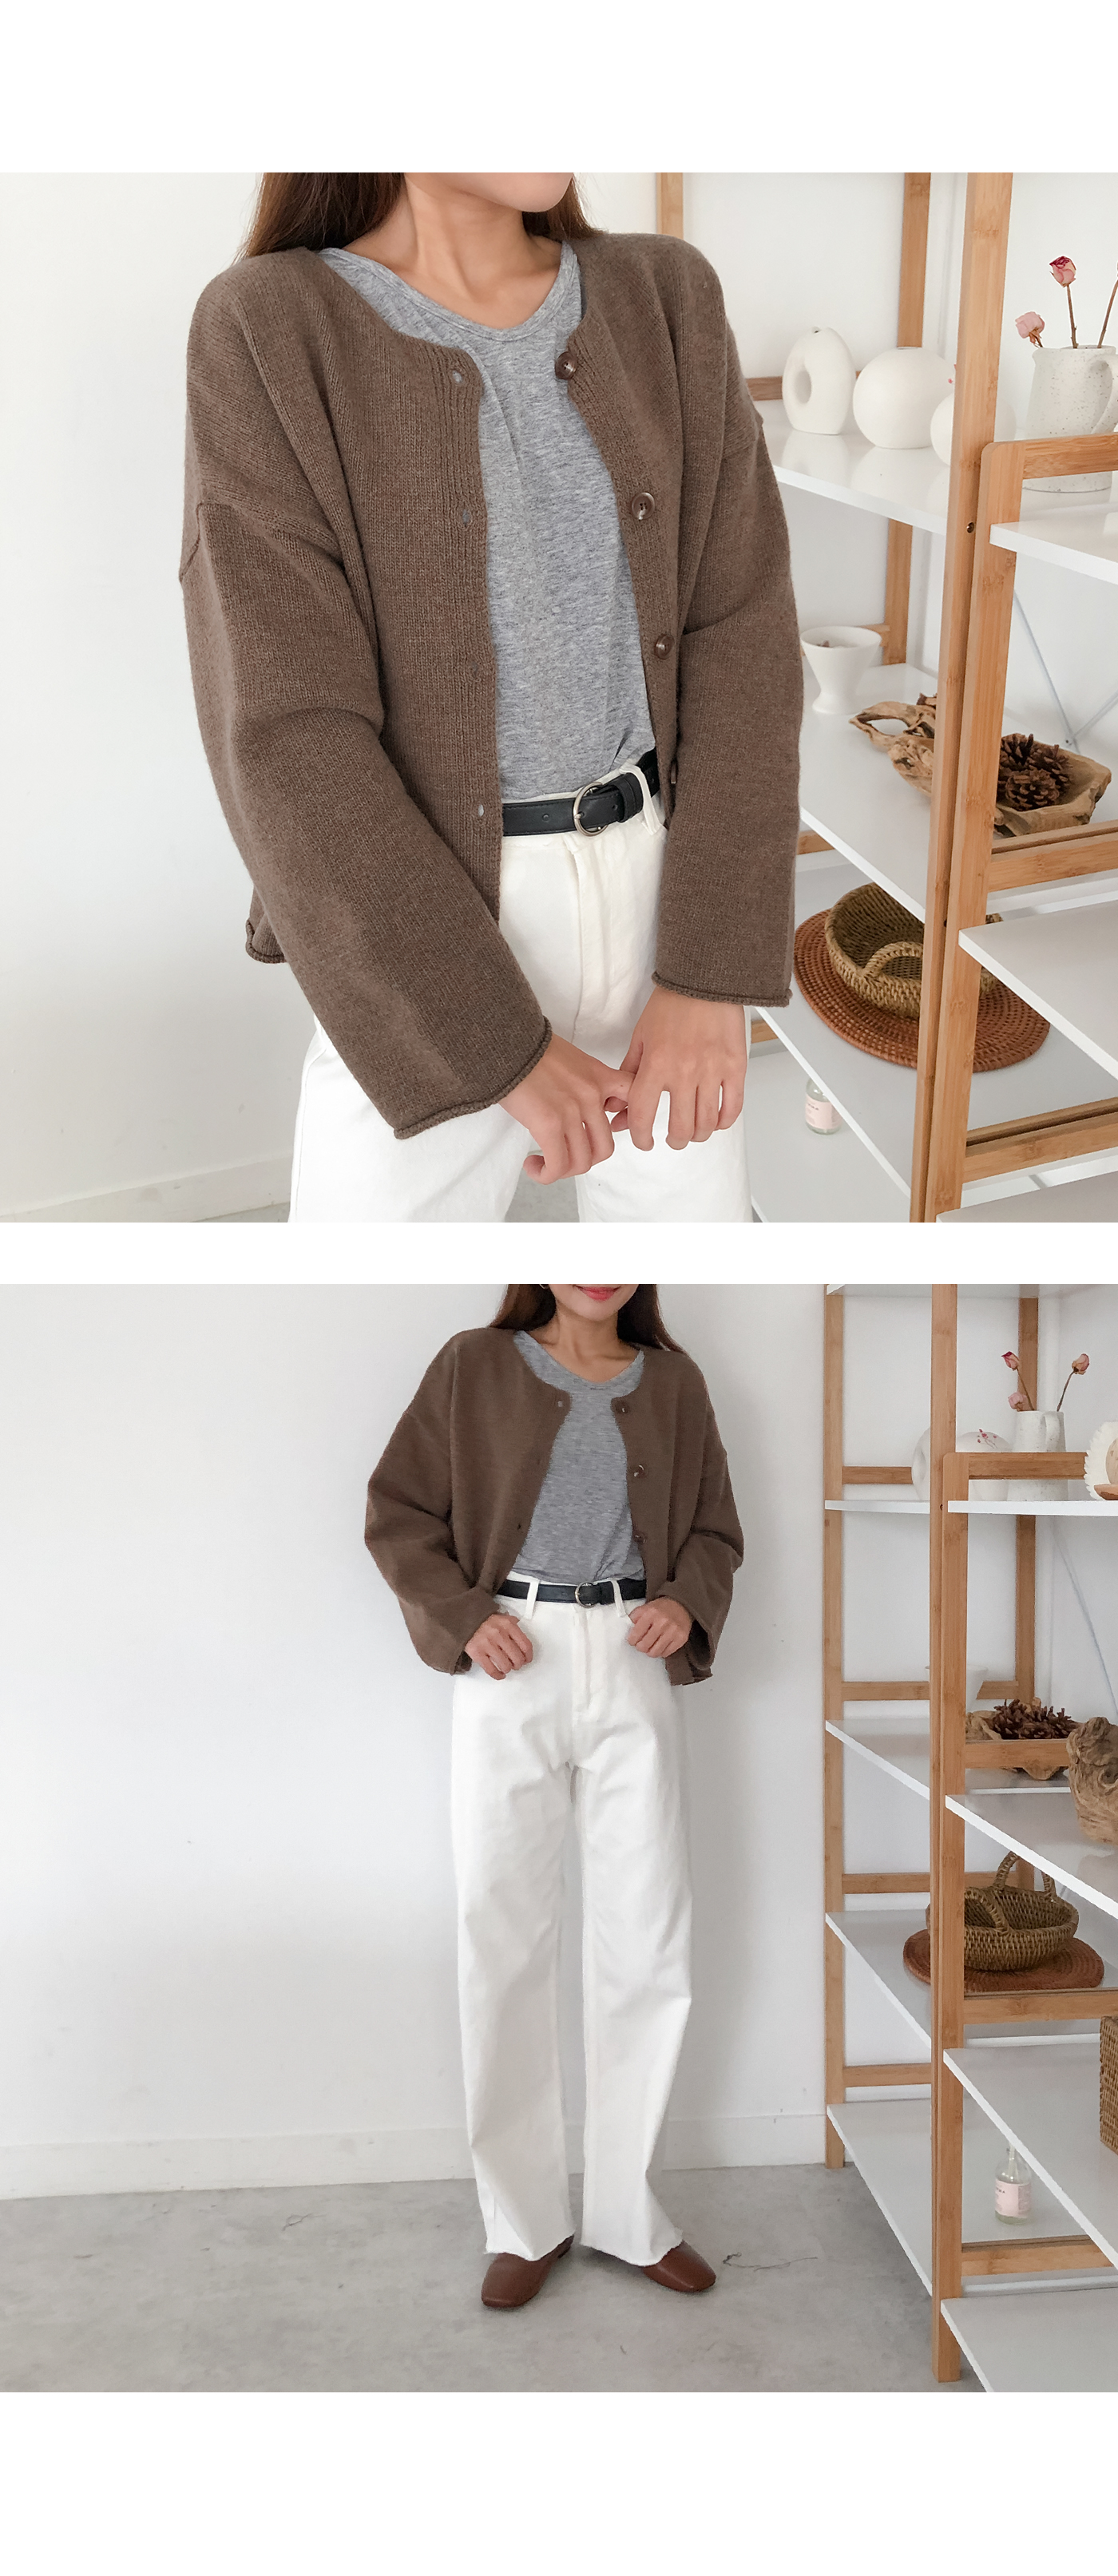 Rondo casual pants